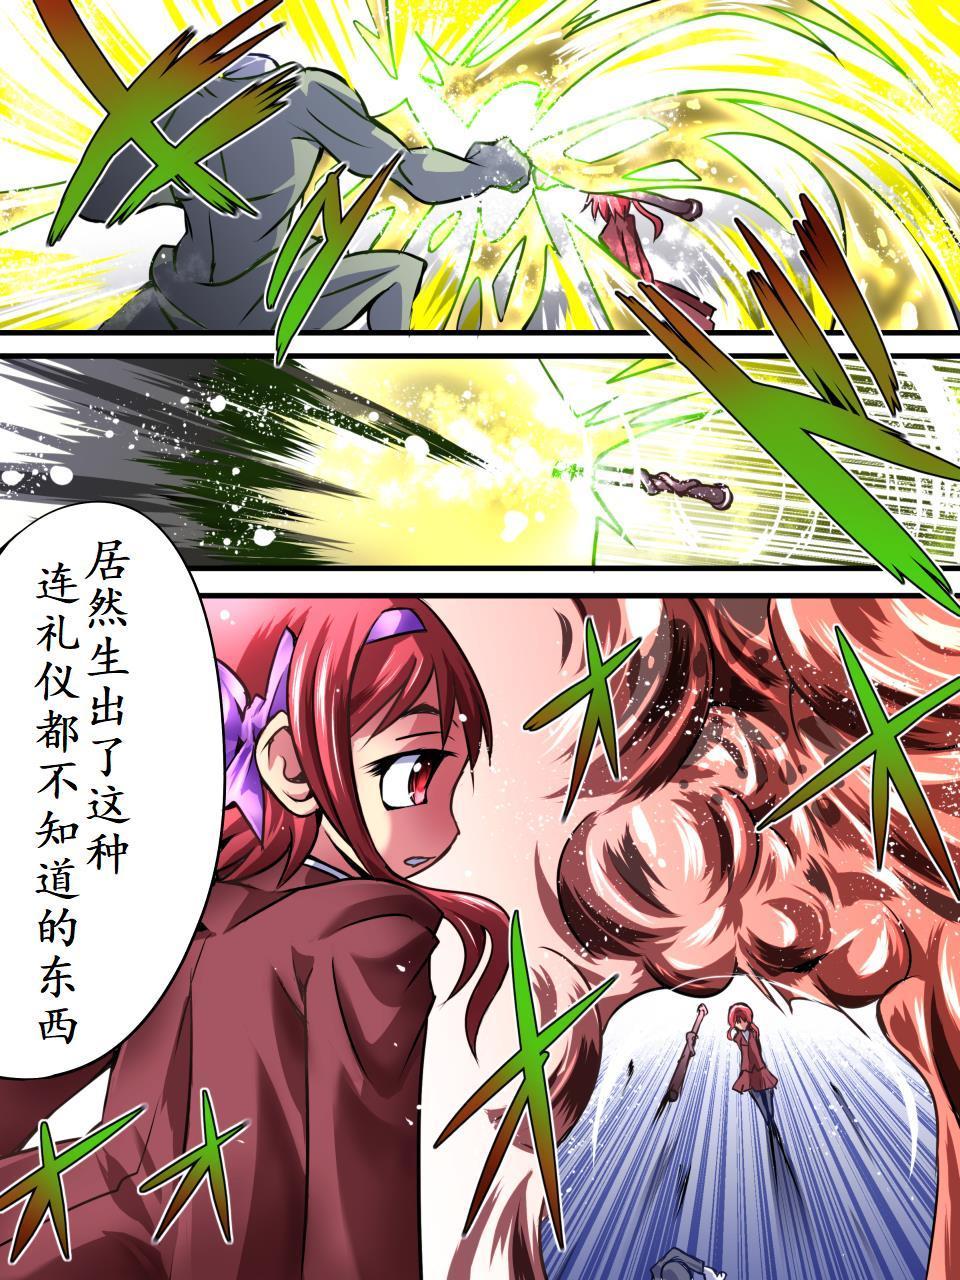 [Atelier Hachifukuan] Superheroine Yuukai Ryoujoku III - Superheroine in Distress [Chrome Rose Bell]   凌辱诱拐3 [Chinese] [有条色狼汉化] 5